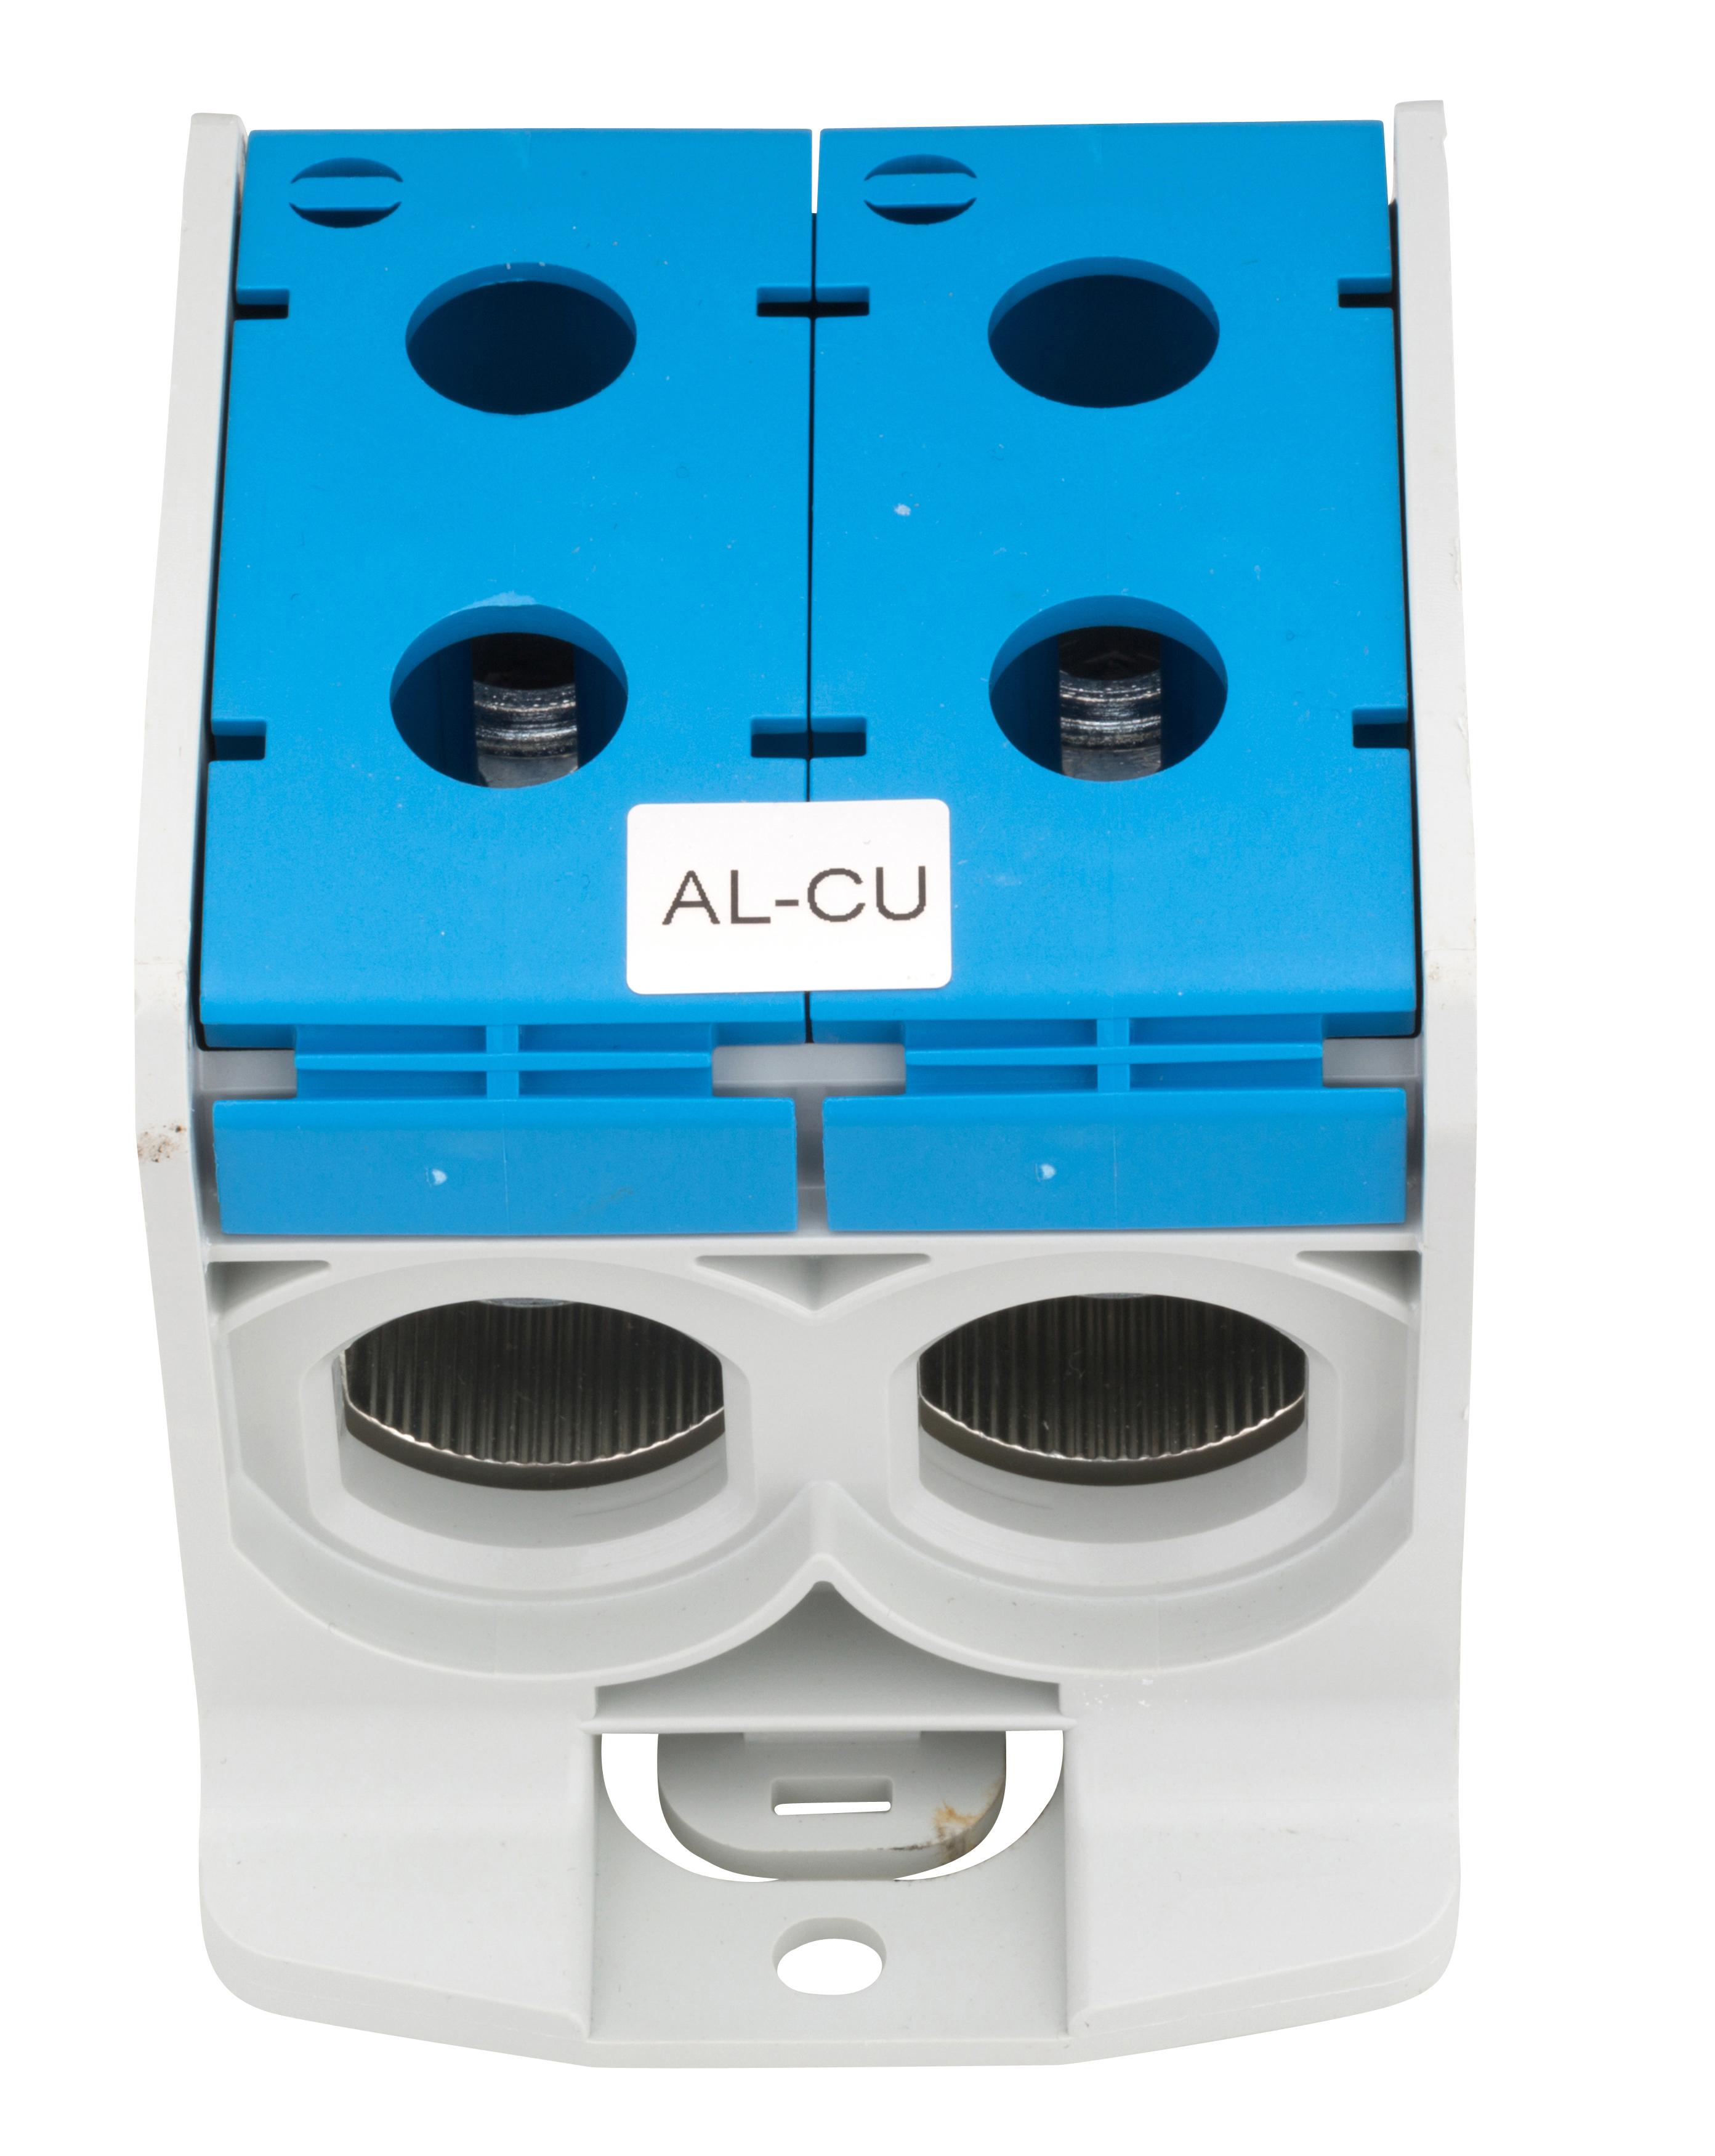 1 Stk Aluminium /Kupfer Klemme, 1-polig, Doppel 300mm² blau IKA21726--